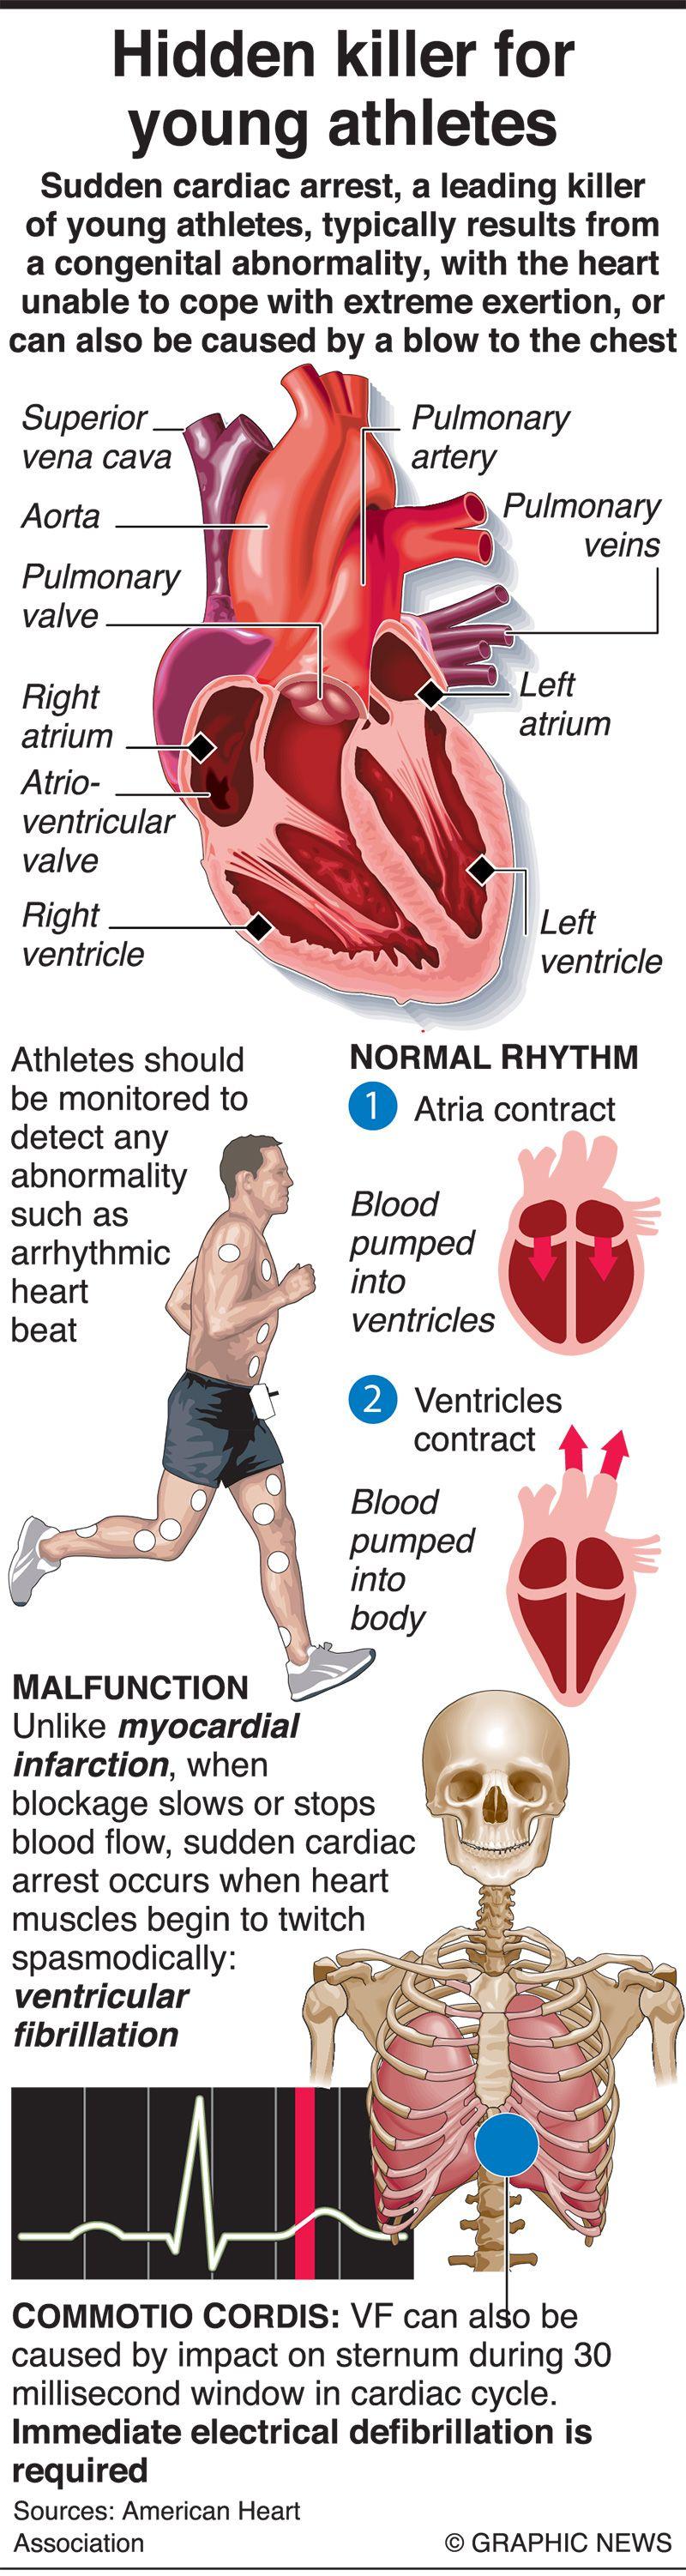 Infographics: Sudden cardiac arrest is a hidden killer for young athletes